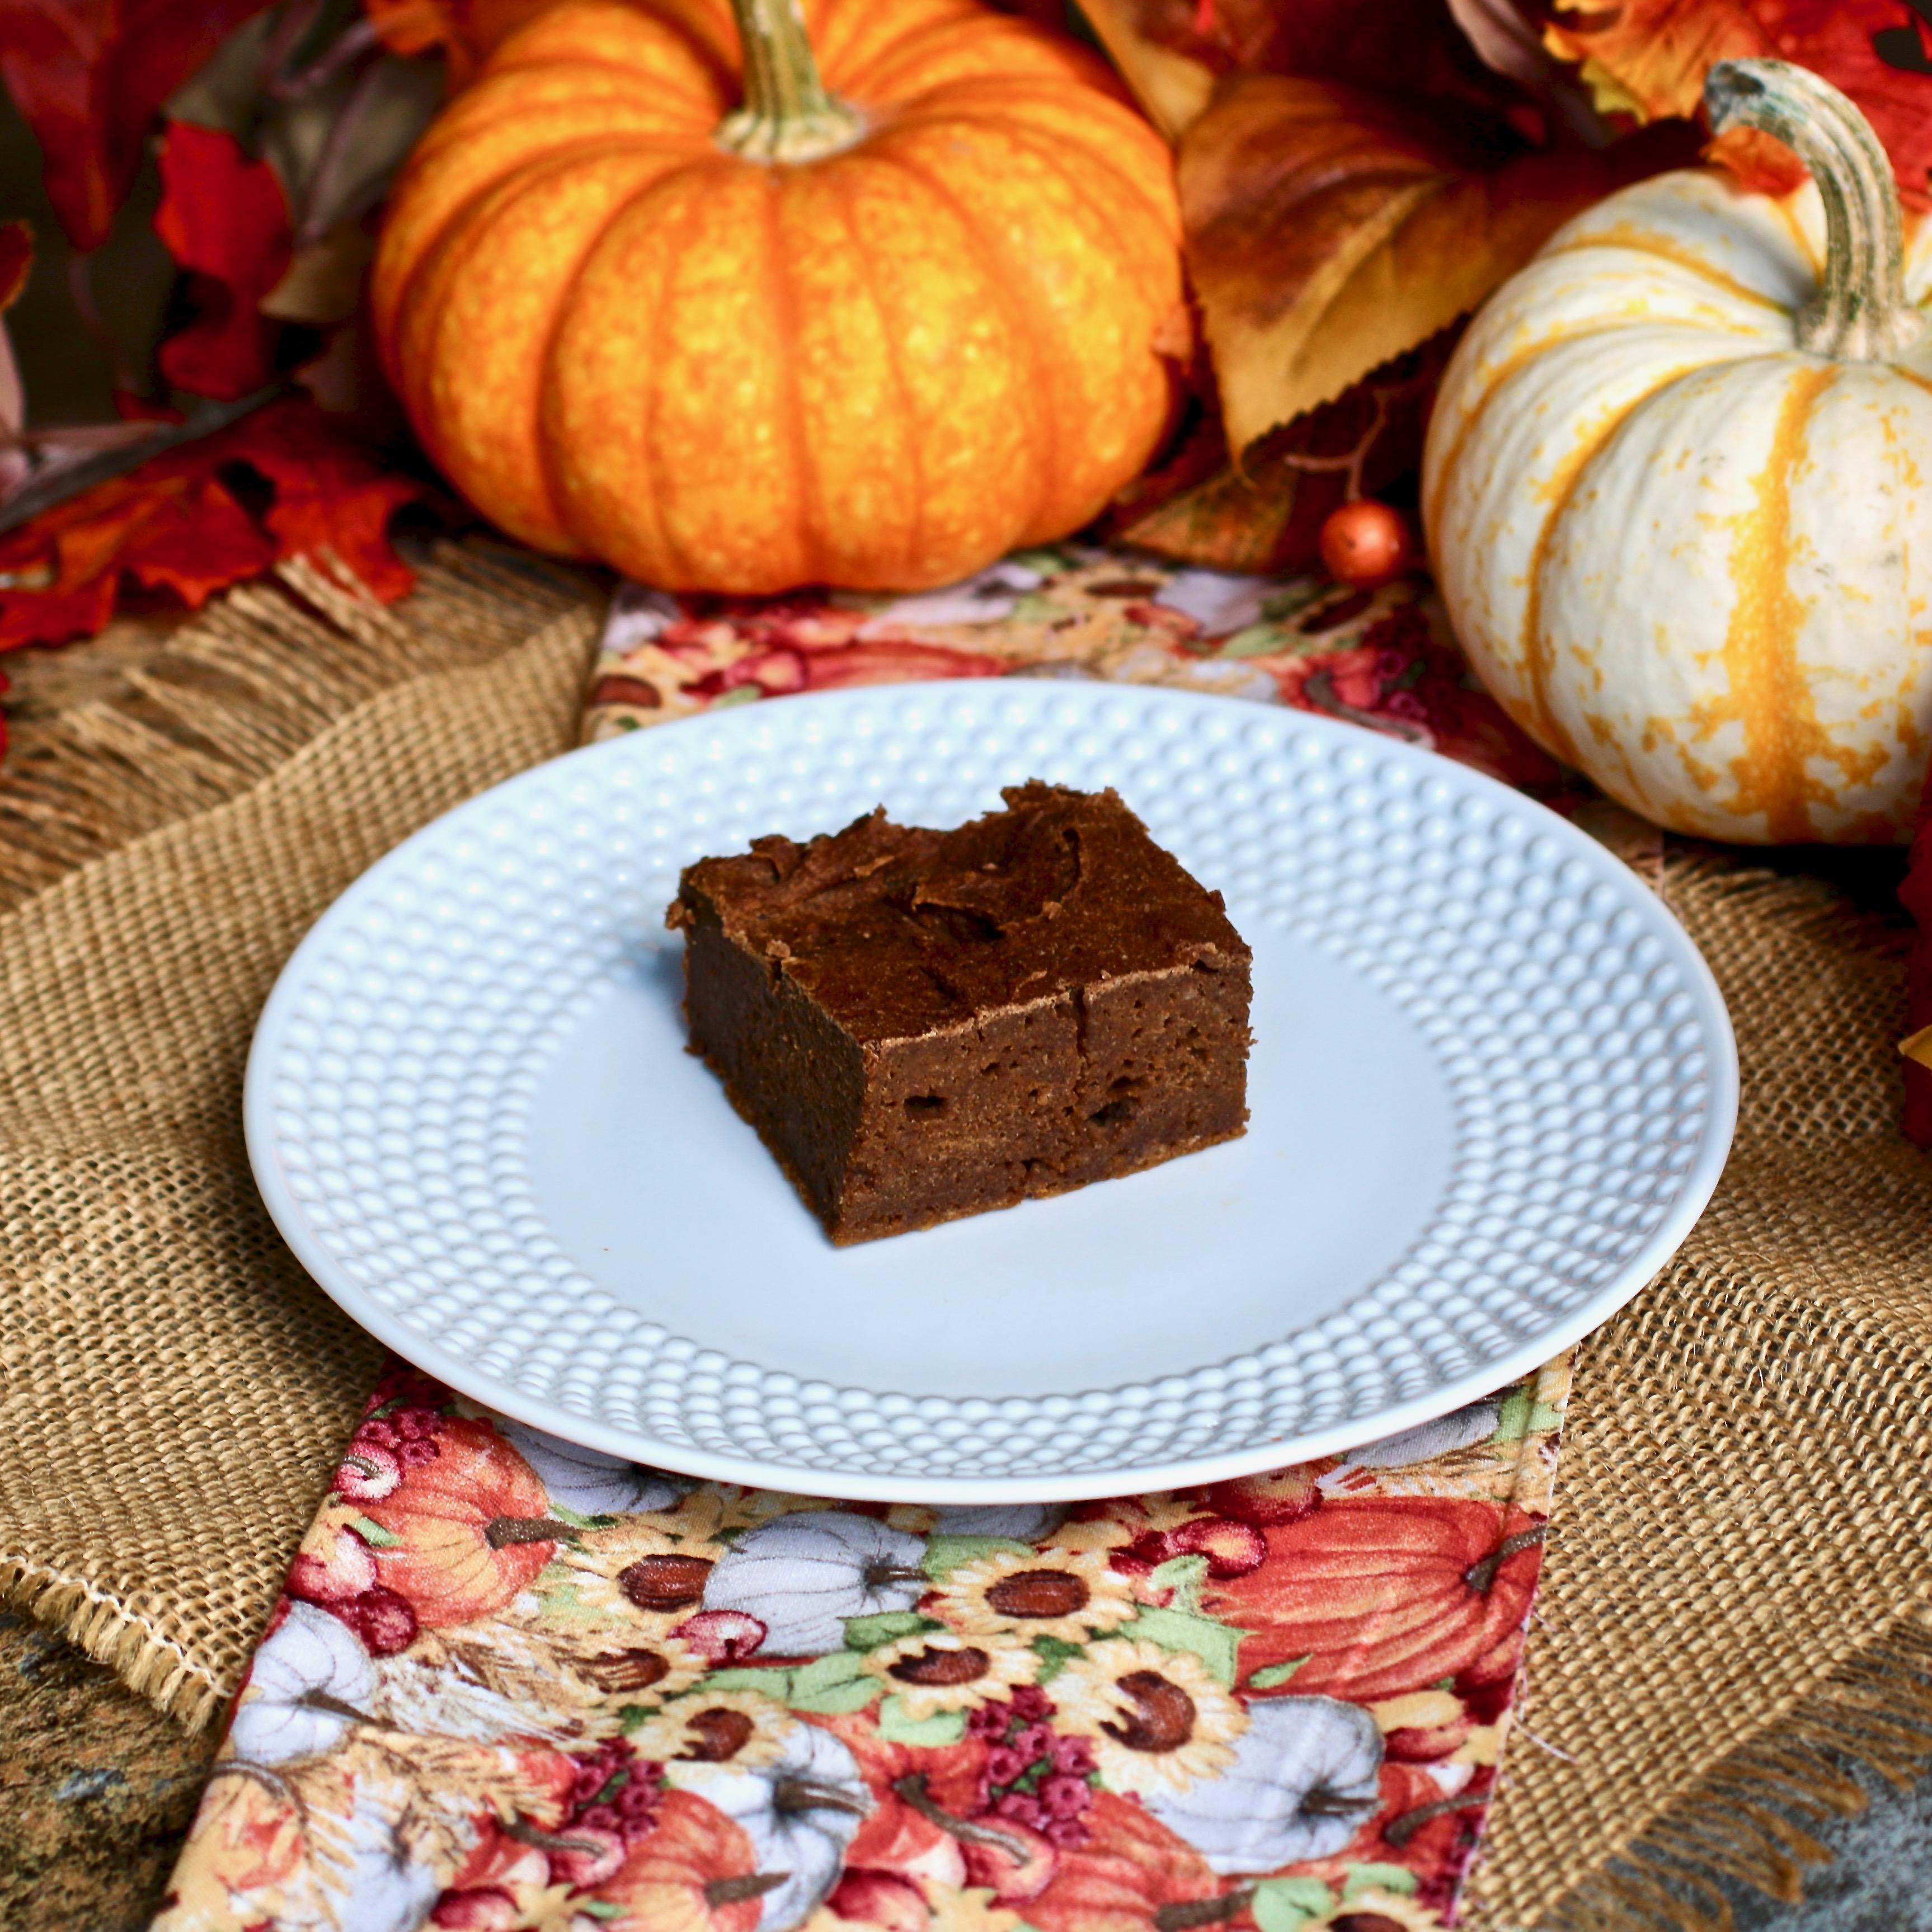 Chocolate-Pumpkin Brownies chernobletink